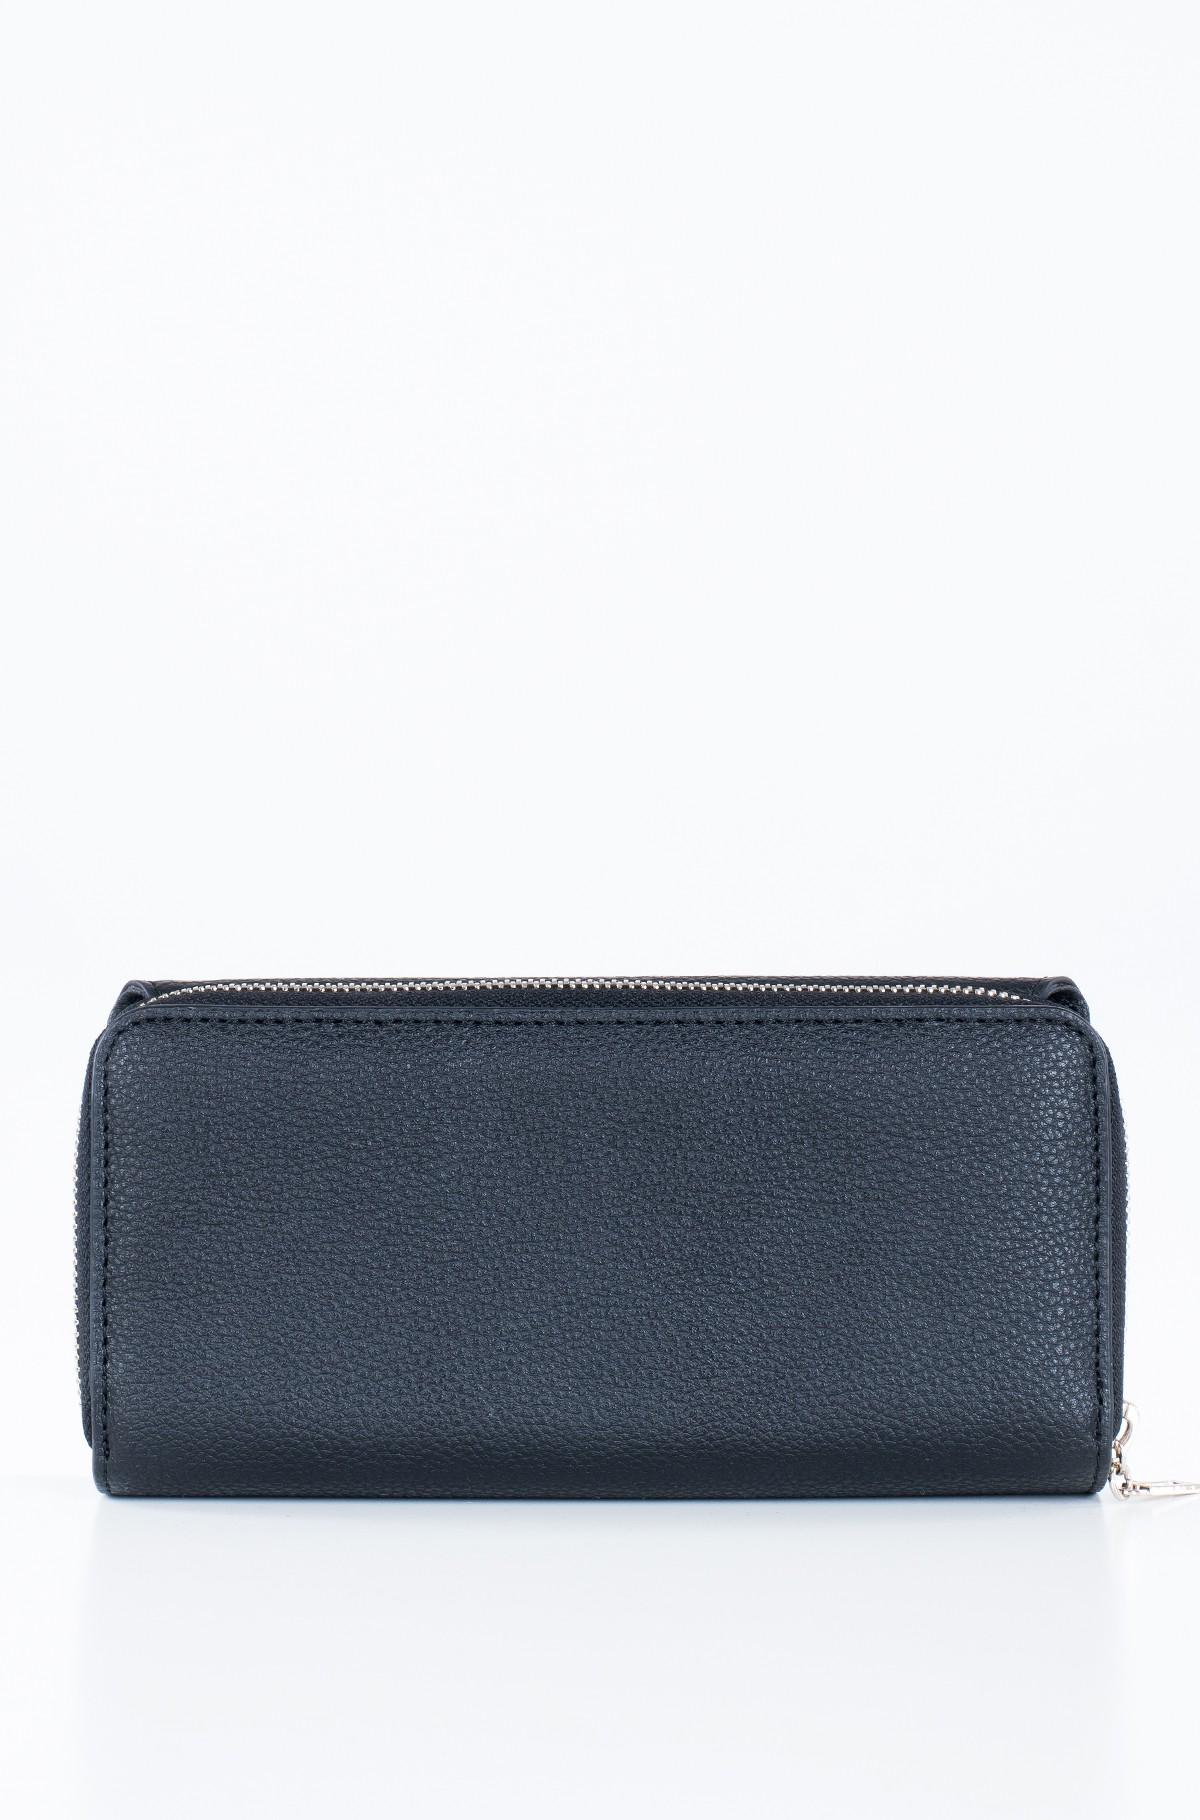 Wallet SWVG68 53620-full-2